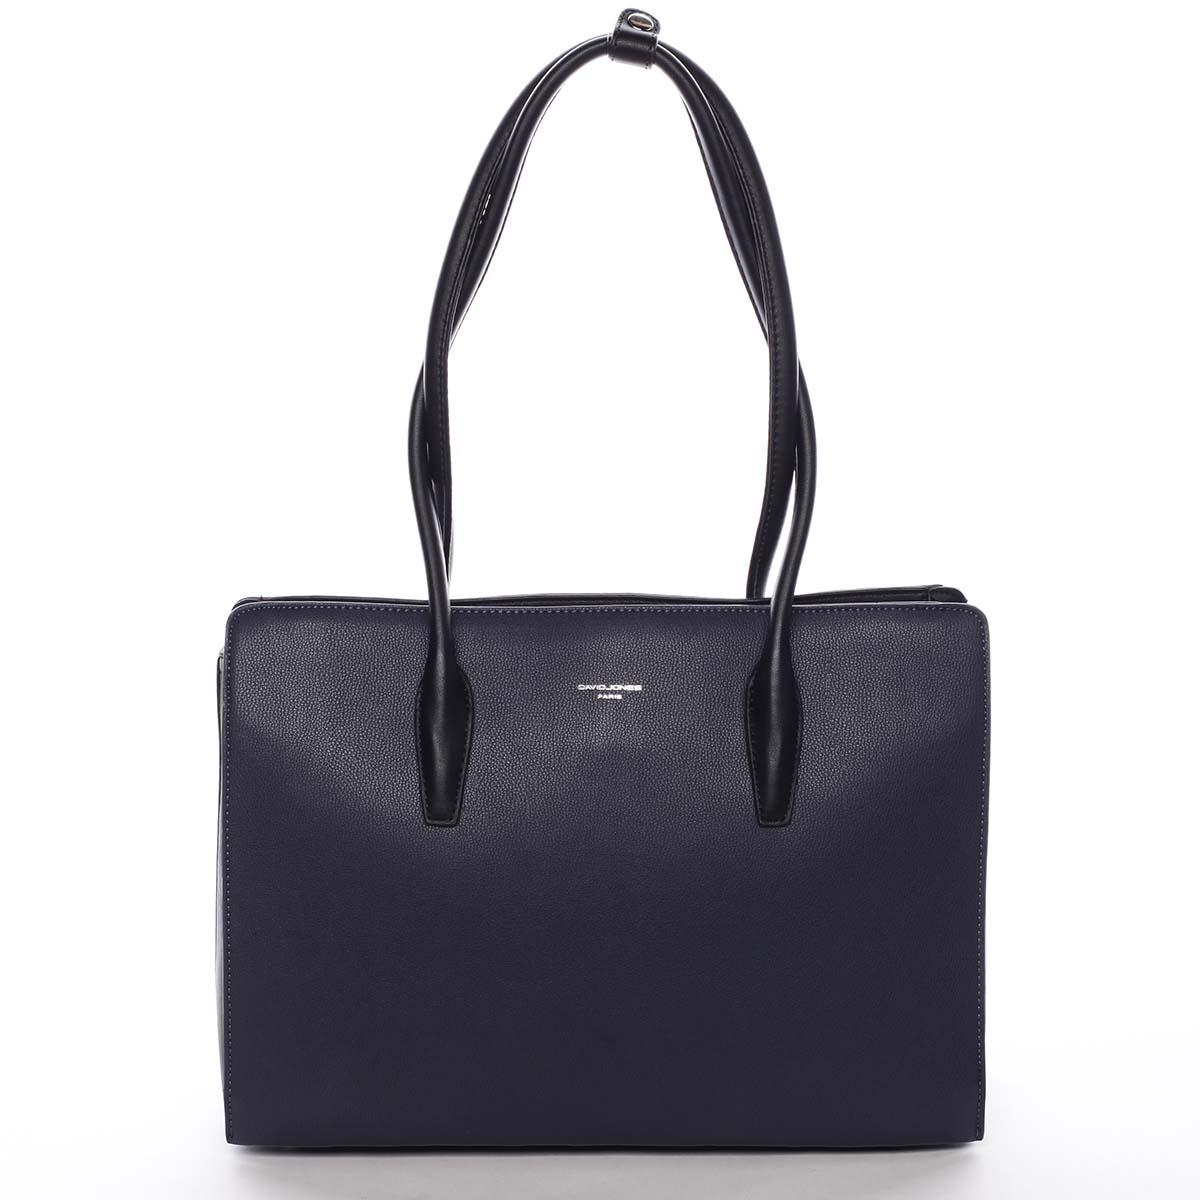 Veľká dámska kabelka cez rameno tmavo modrá - David Jones Adalgisa modrá